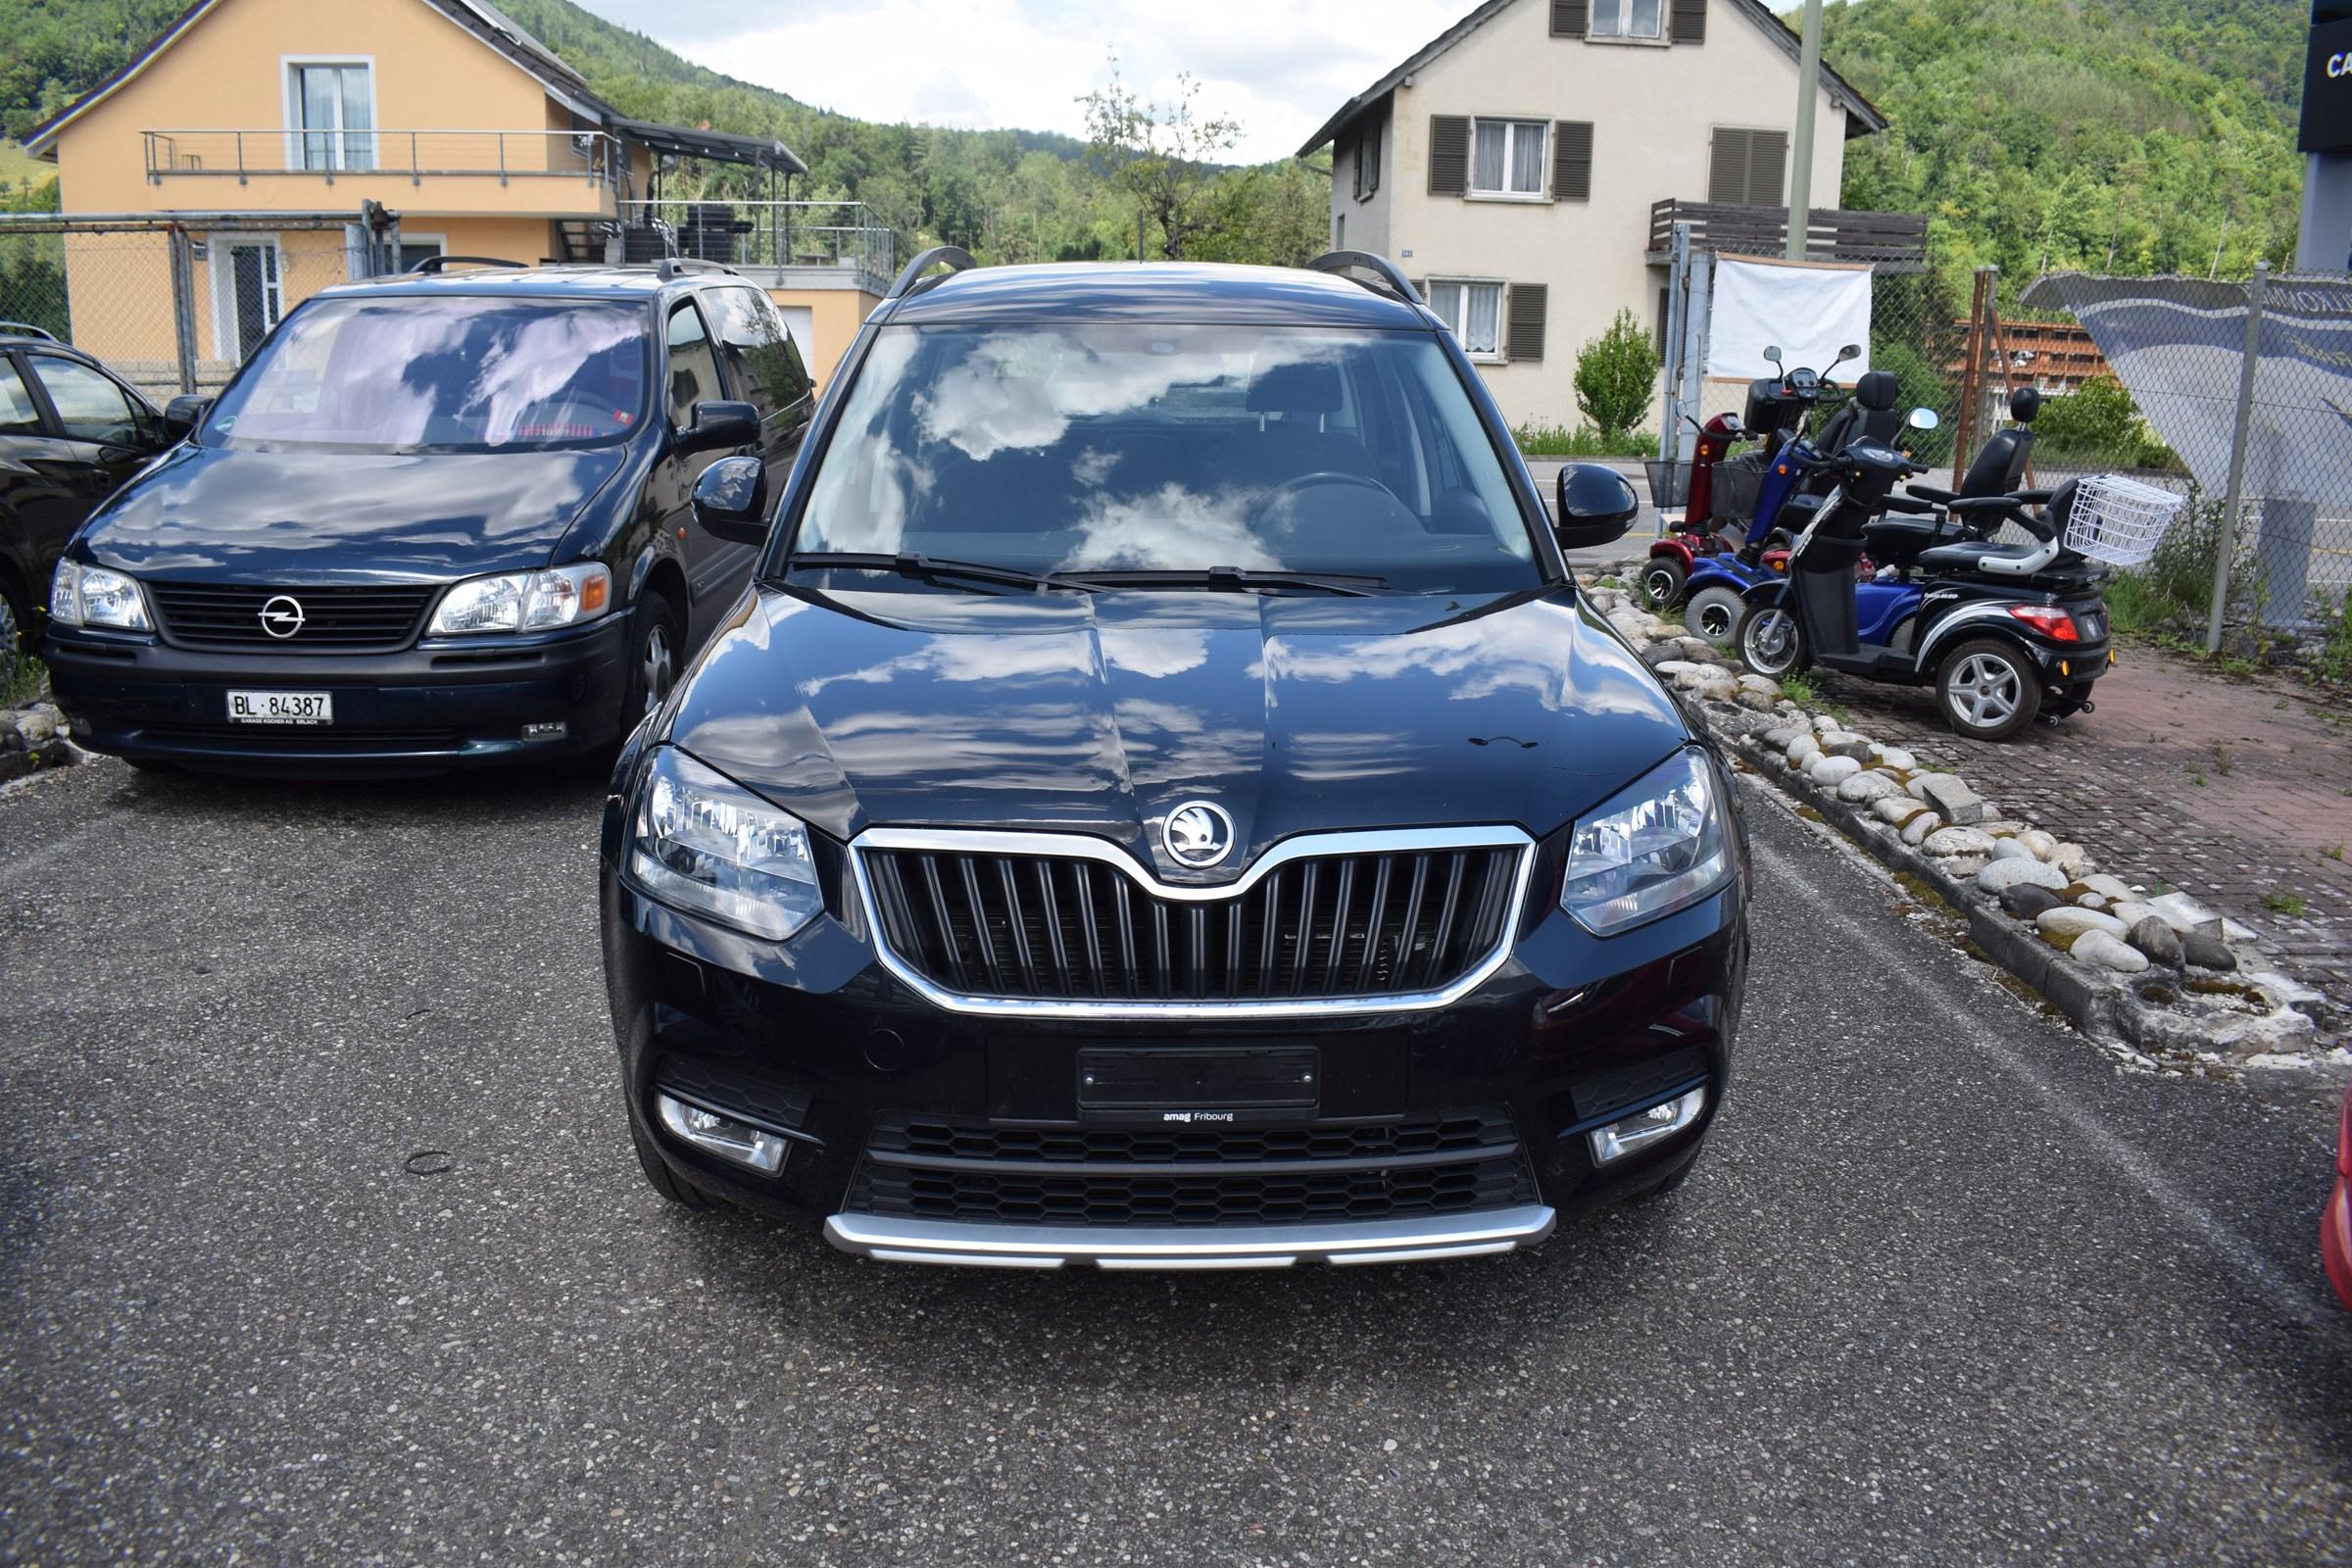 Vehicule D Occasion Suv Skoda Yeti 1 2 Tsi Ambition 4x2 Dsg 74000 Km Pour 12900 Chf Acheter Sur Carforyou Ch